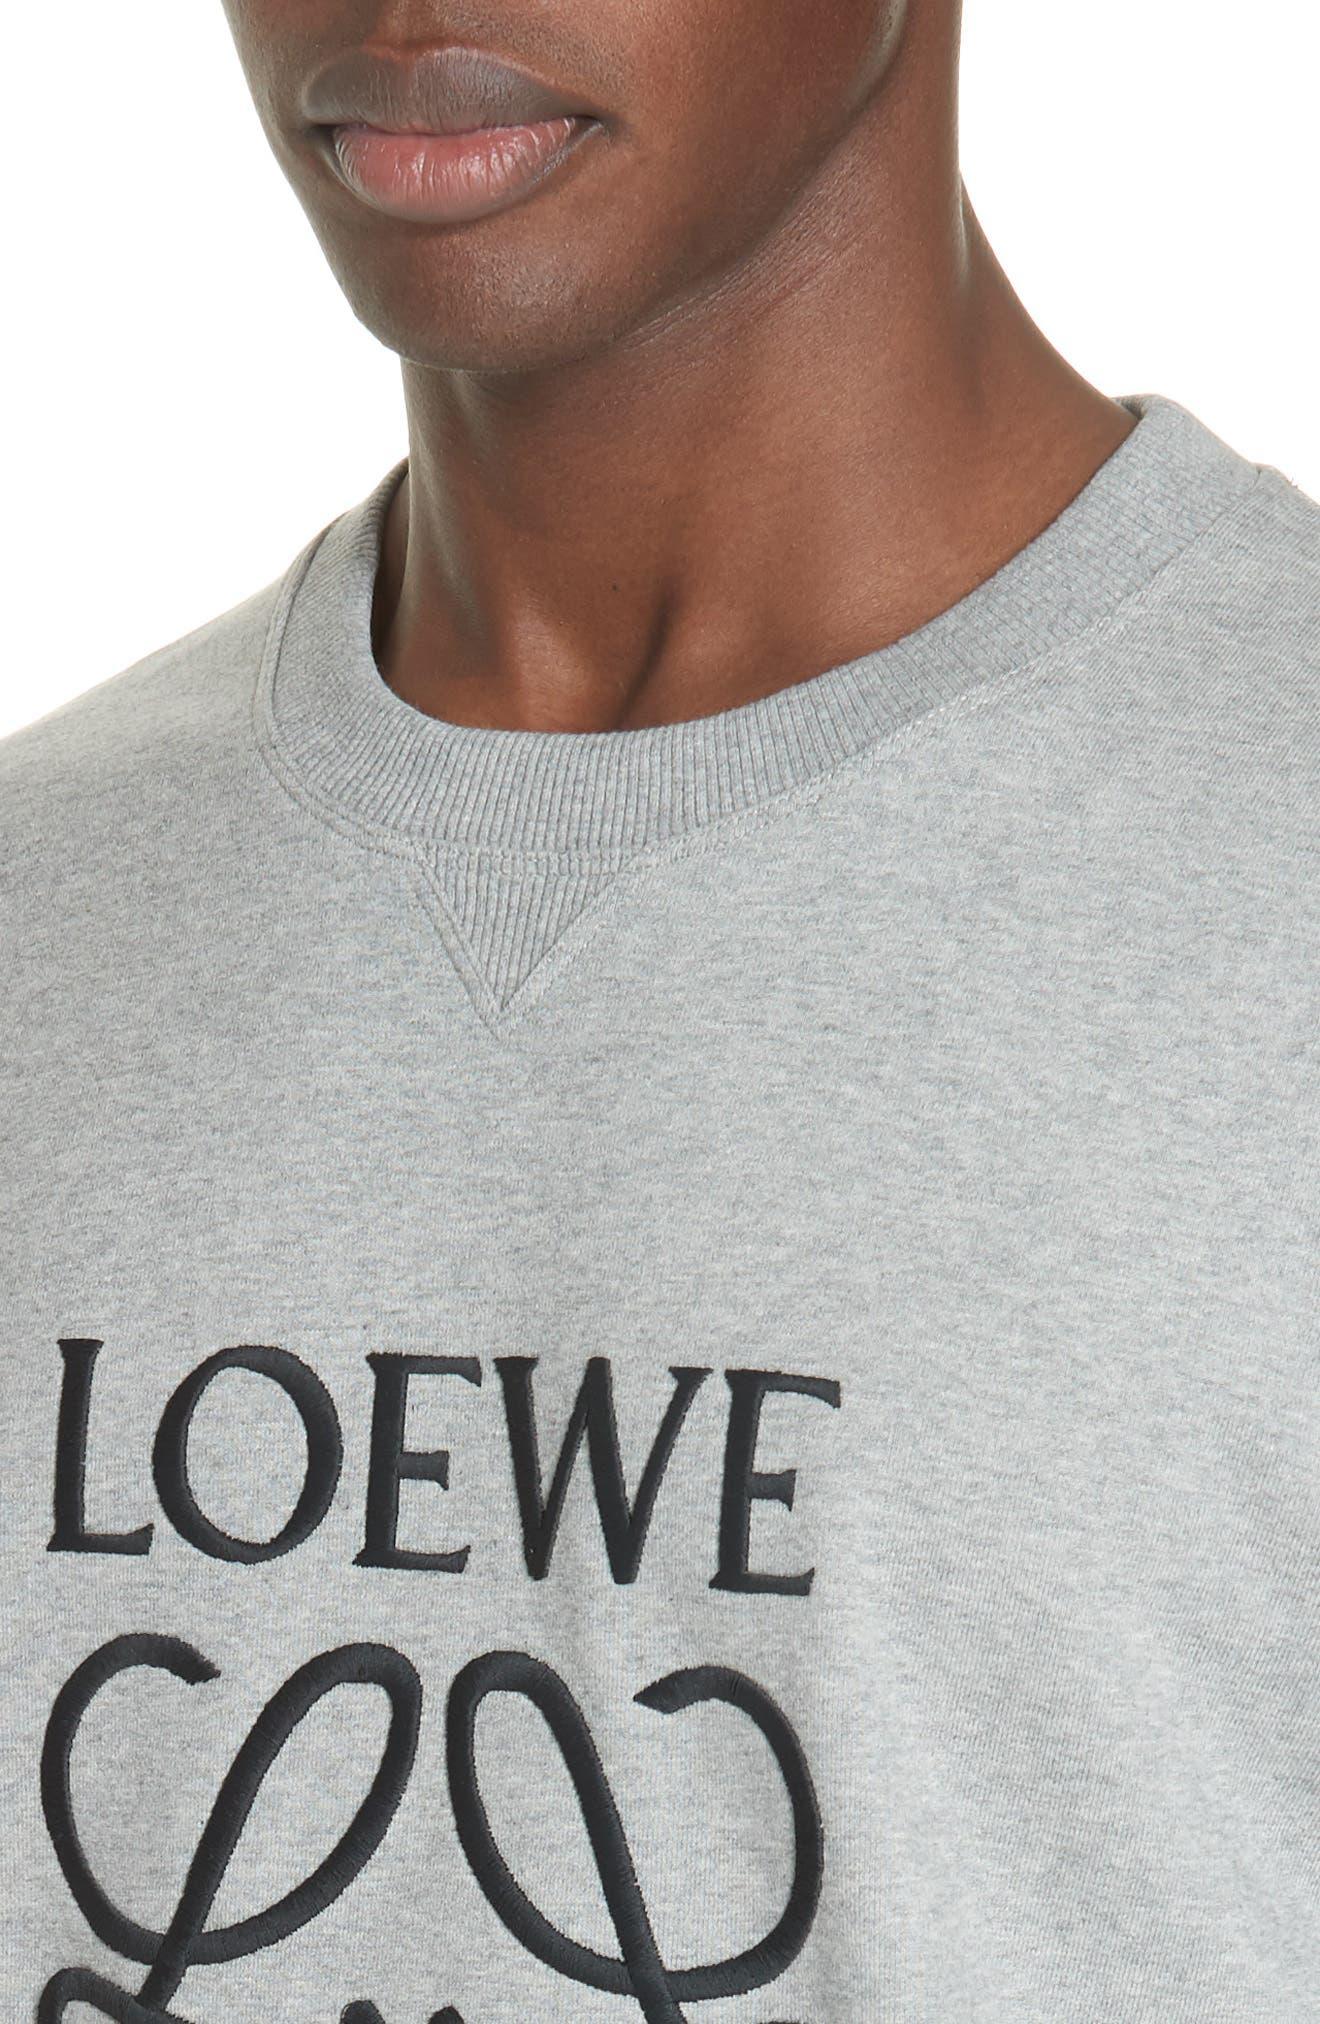 LOEWE, Embroidered Anagram Logo Sweatshirt, Alternate thumbnail 4, color, 1120 GREY